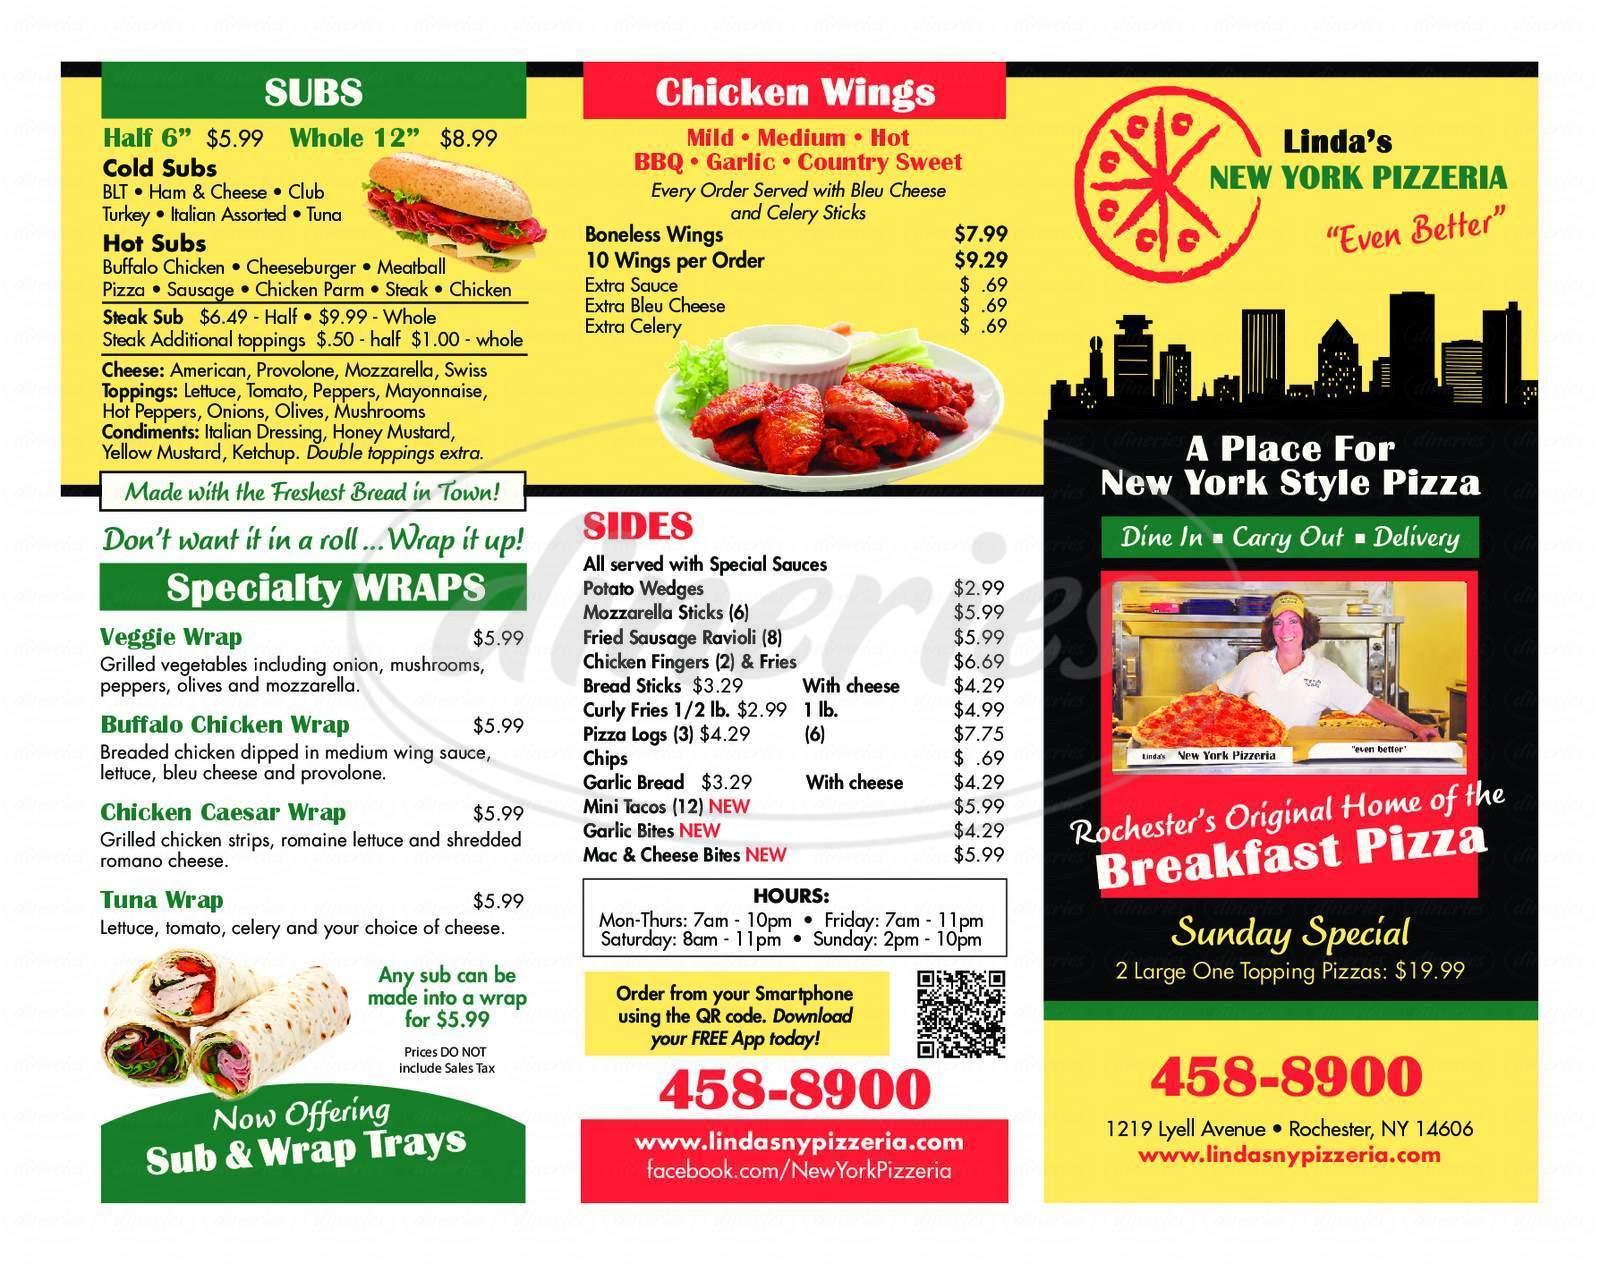 menu for Linda's New York Pizzeria